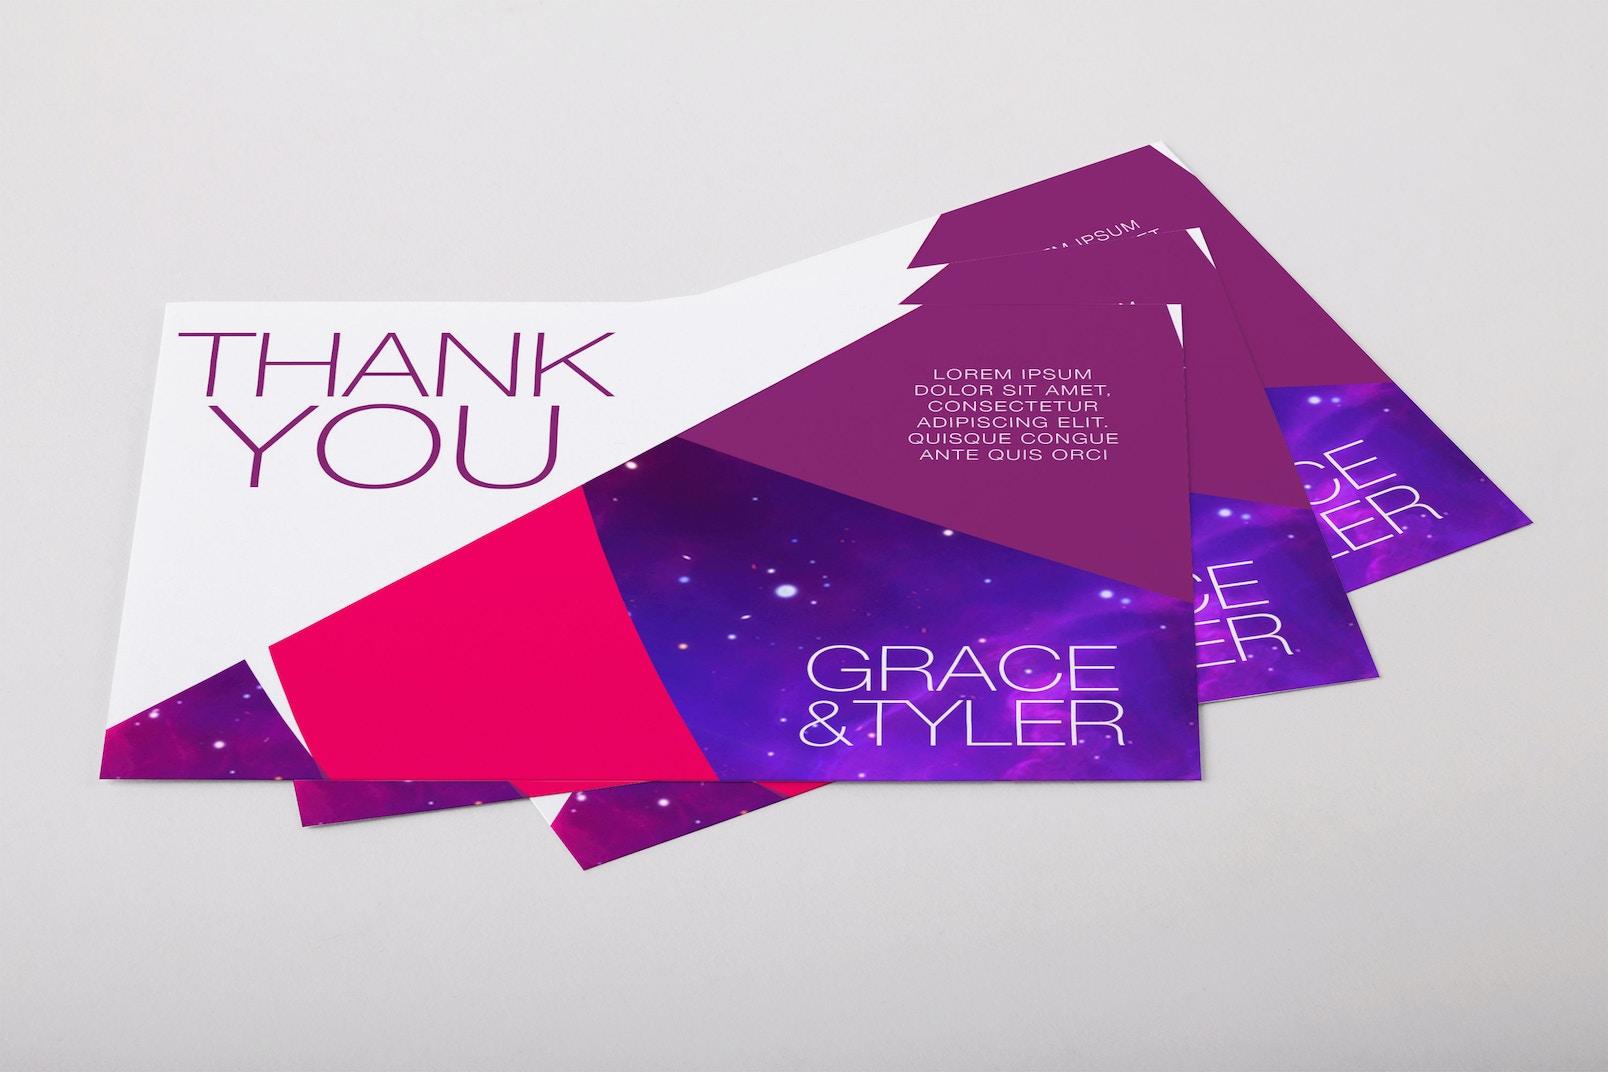 Thank You Card Mini PSD Mockup 01